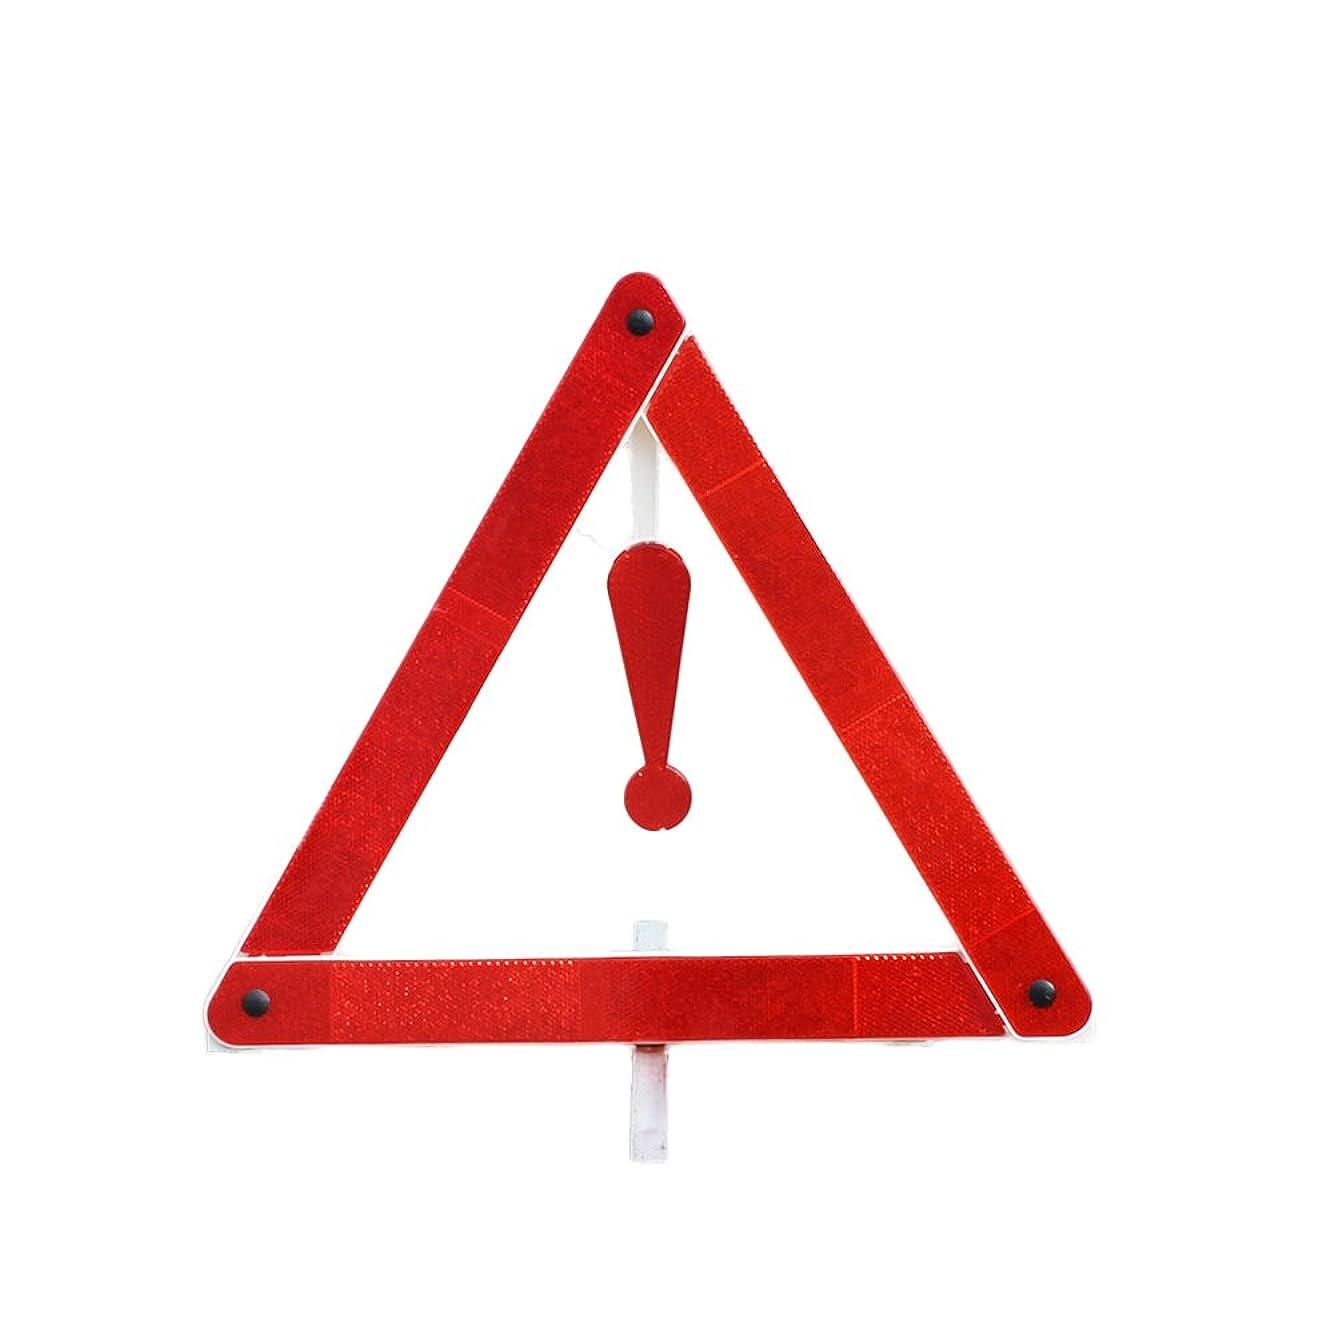 波トレーダー確率Grandmart 三角停止板 折り畳み式 自動車用 三角表示板 警告 故障 緊急対応用品 コンパクトに収納可能